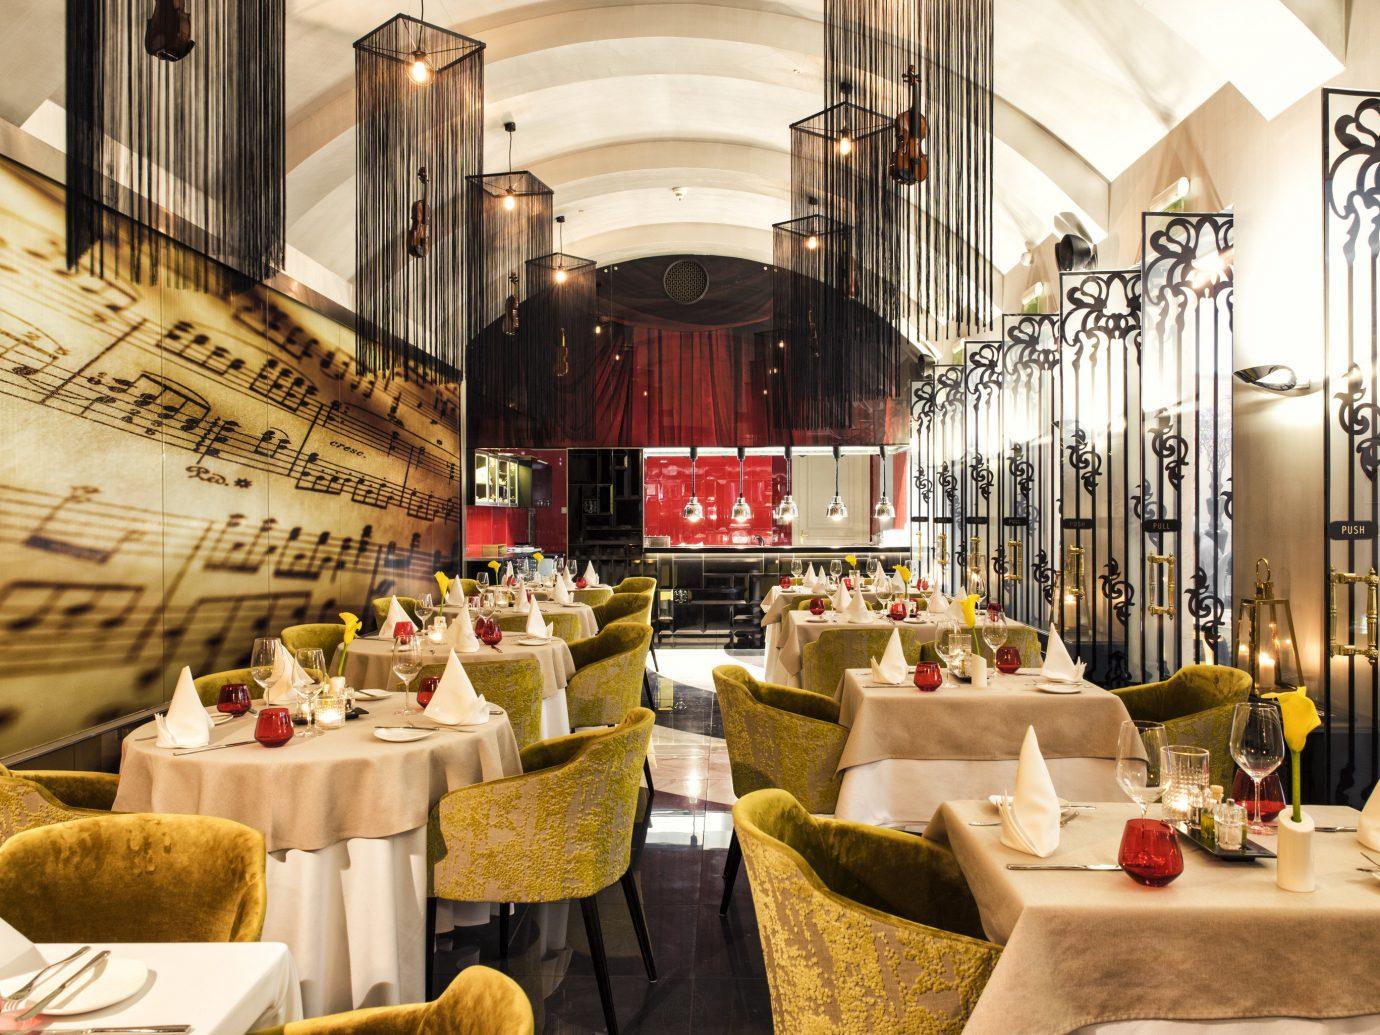 Budapest europe Hotels Hungary table indoor meal function hall restaurant Lobby interior design ballroom